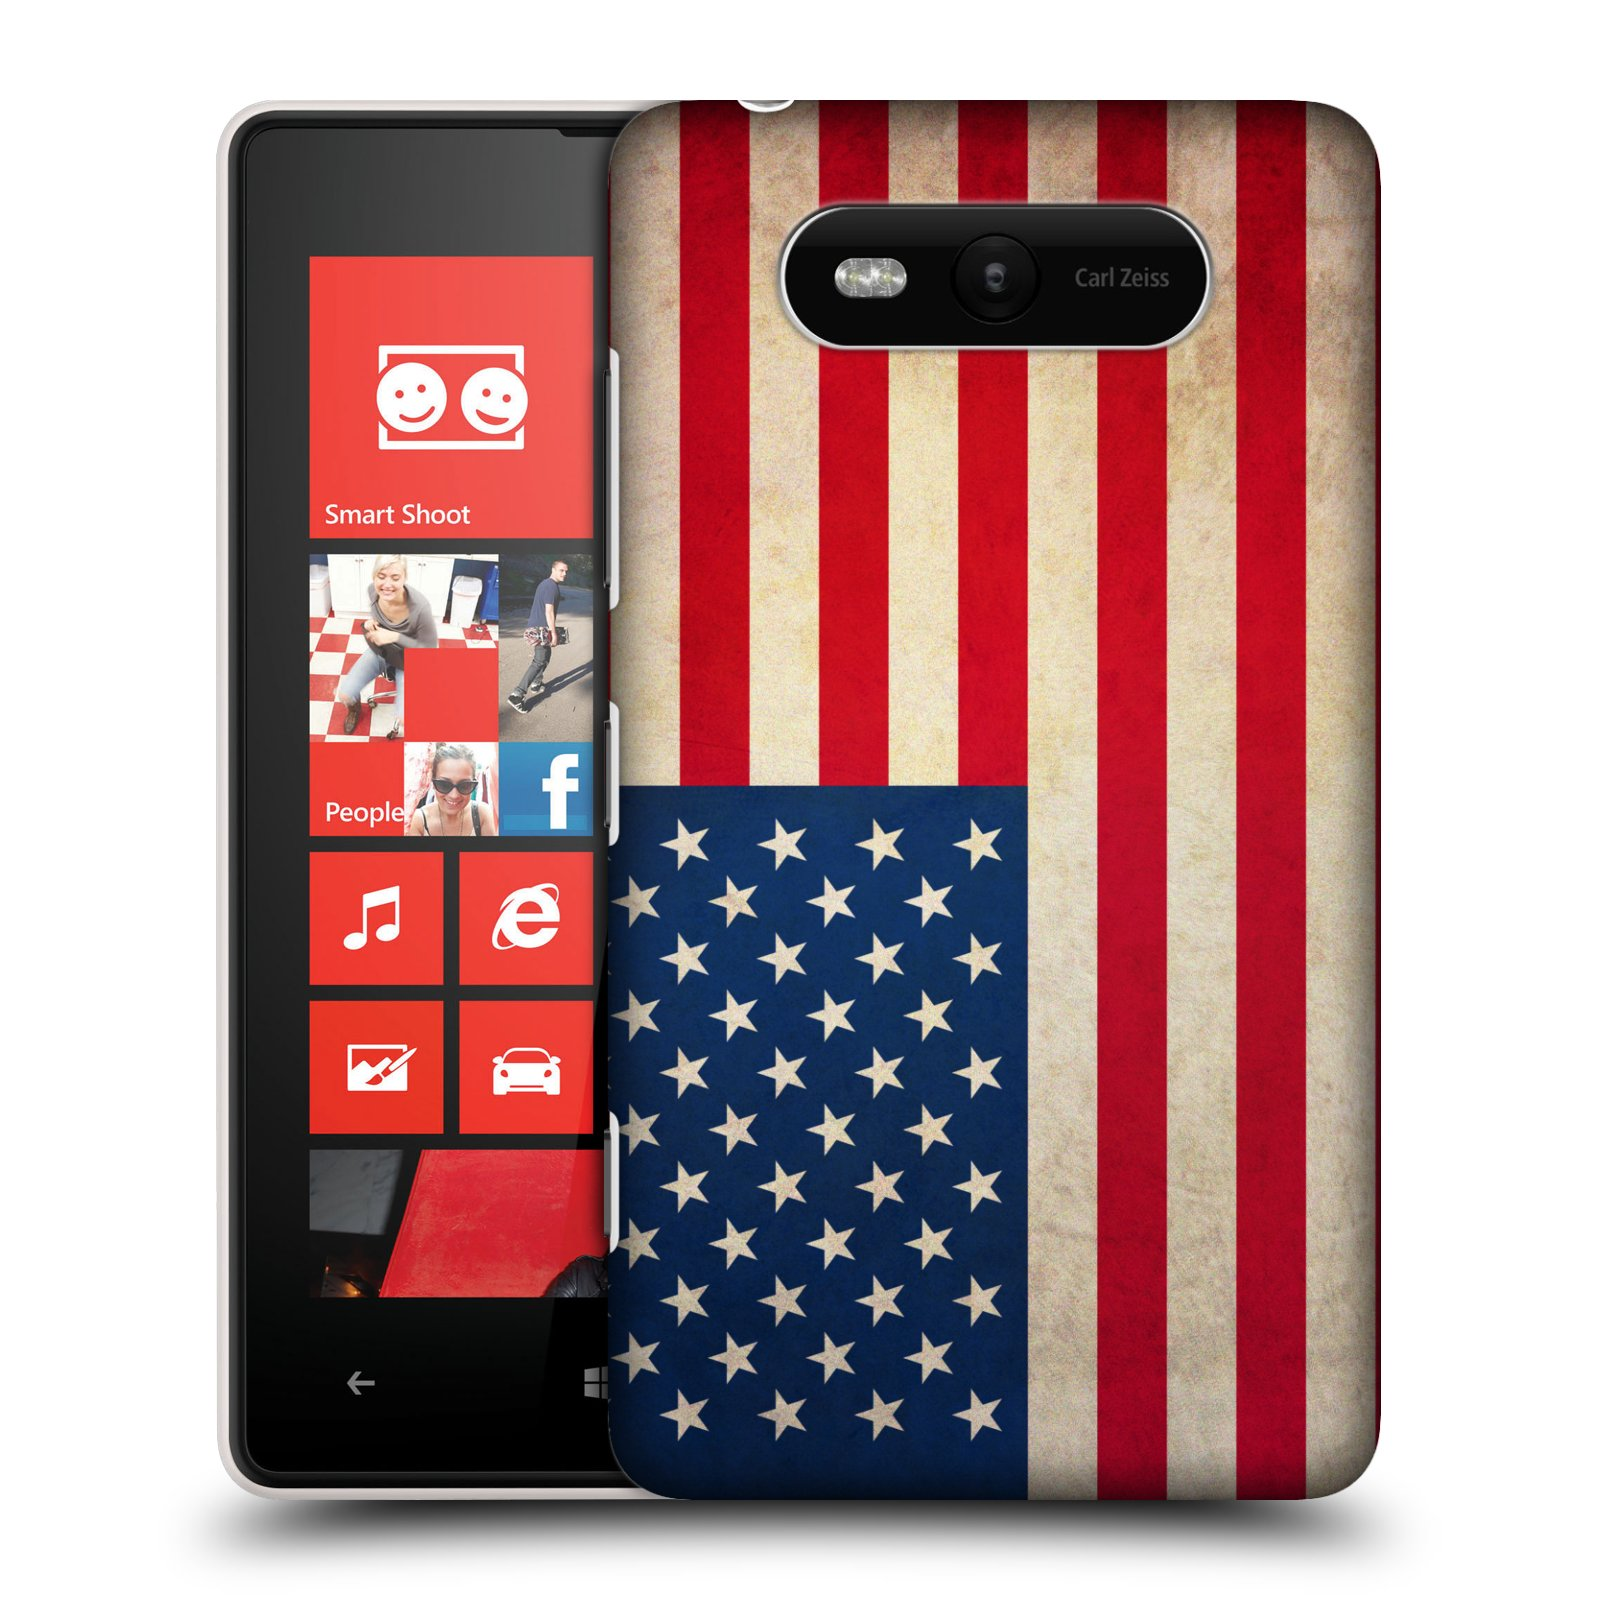 Plastové pouzdro na mobil Nokia Lumia 820 HEAD CASE VLAJKA USA (Kryt či obal na mobilní telefon Nokia Lumia 820)